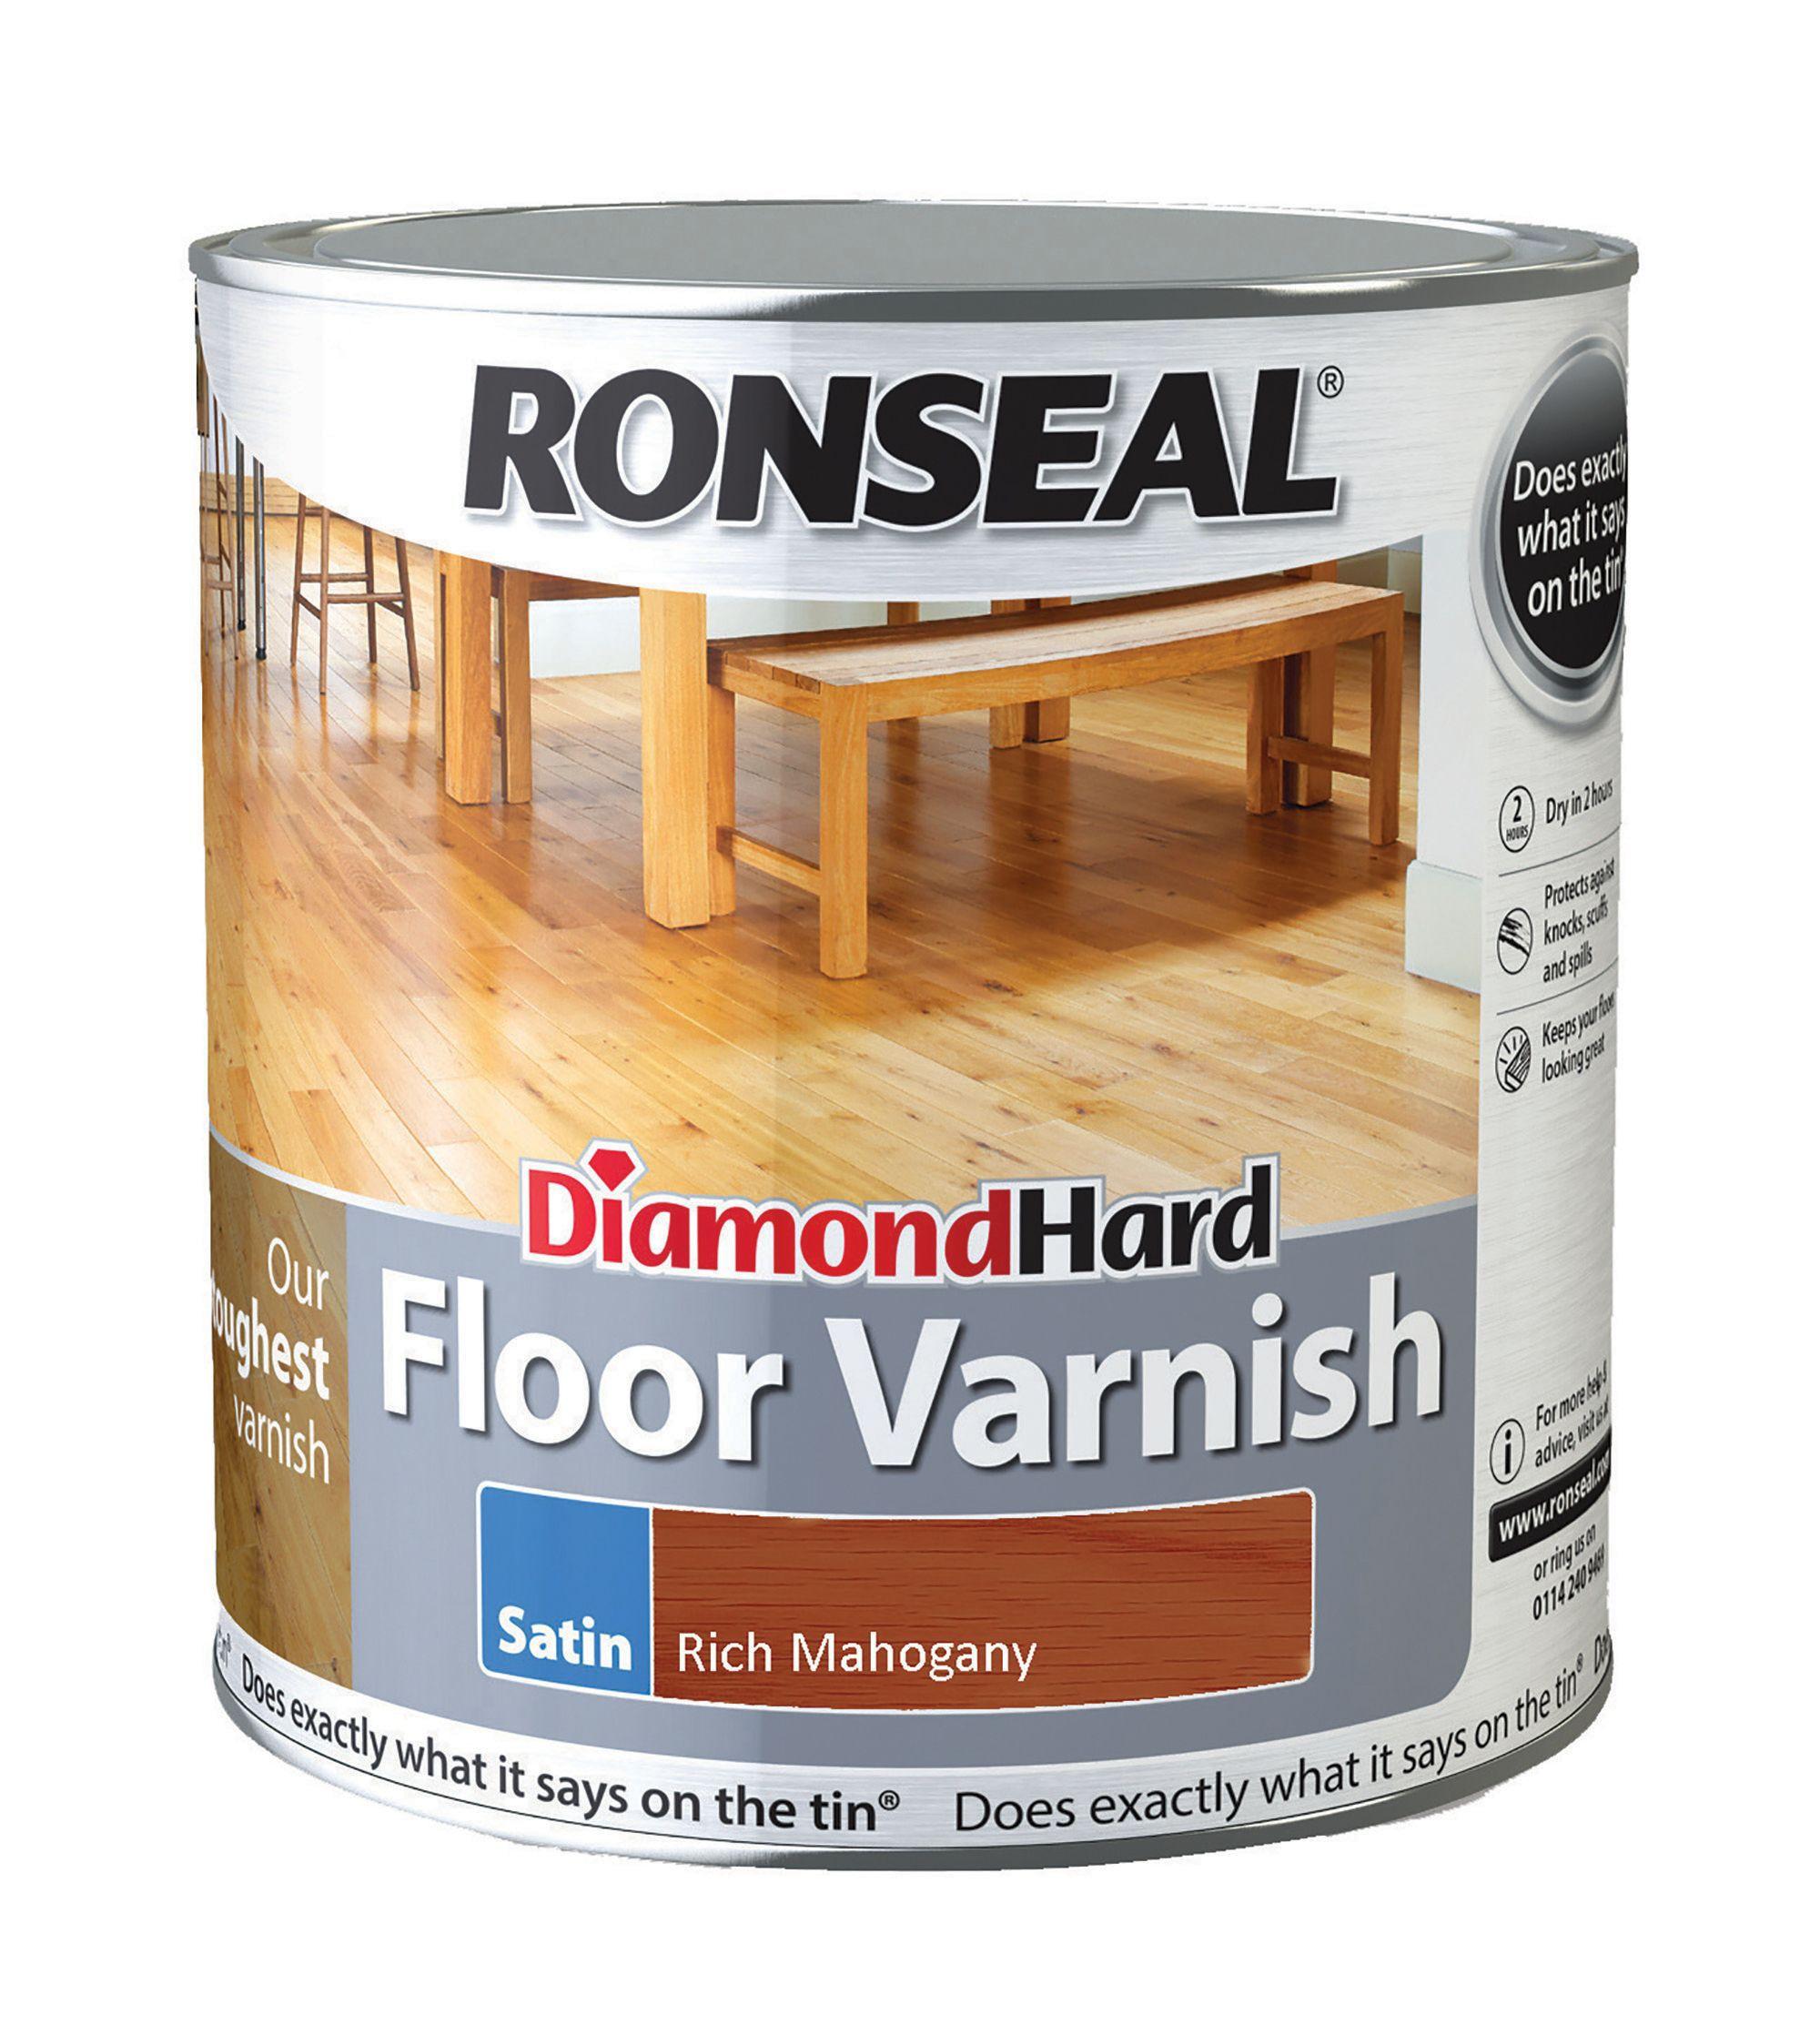 Ronseal Diamond Hard Rich Mahogany Satin Floor Varnish 2.5l